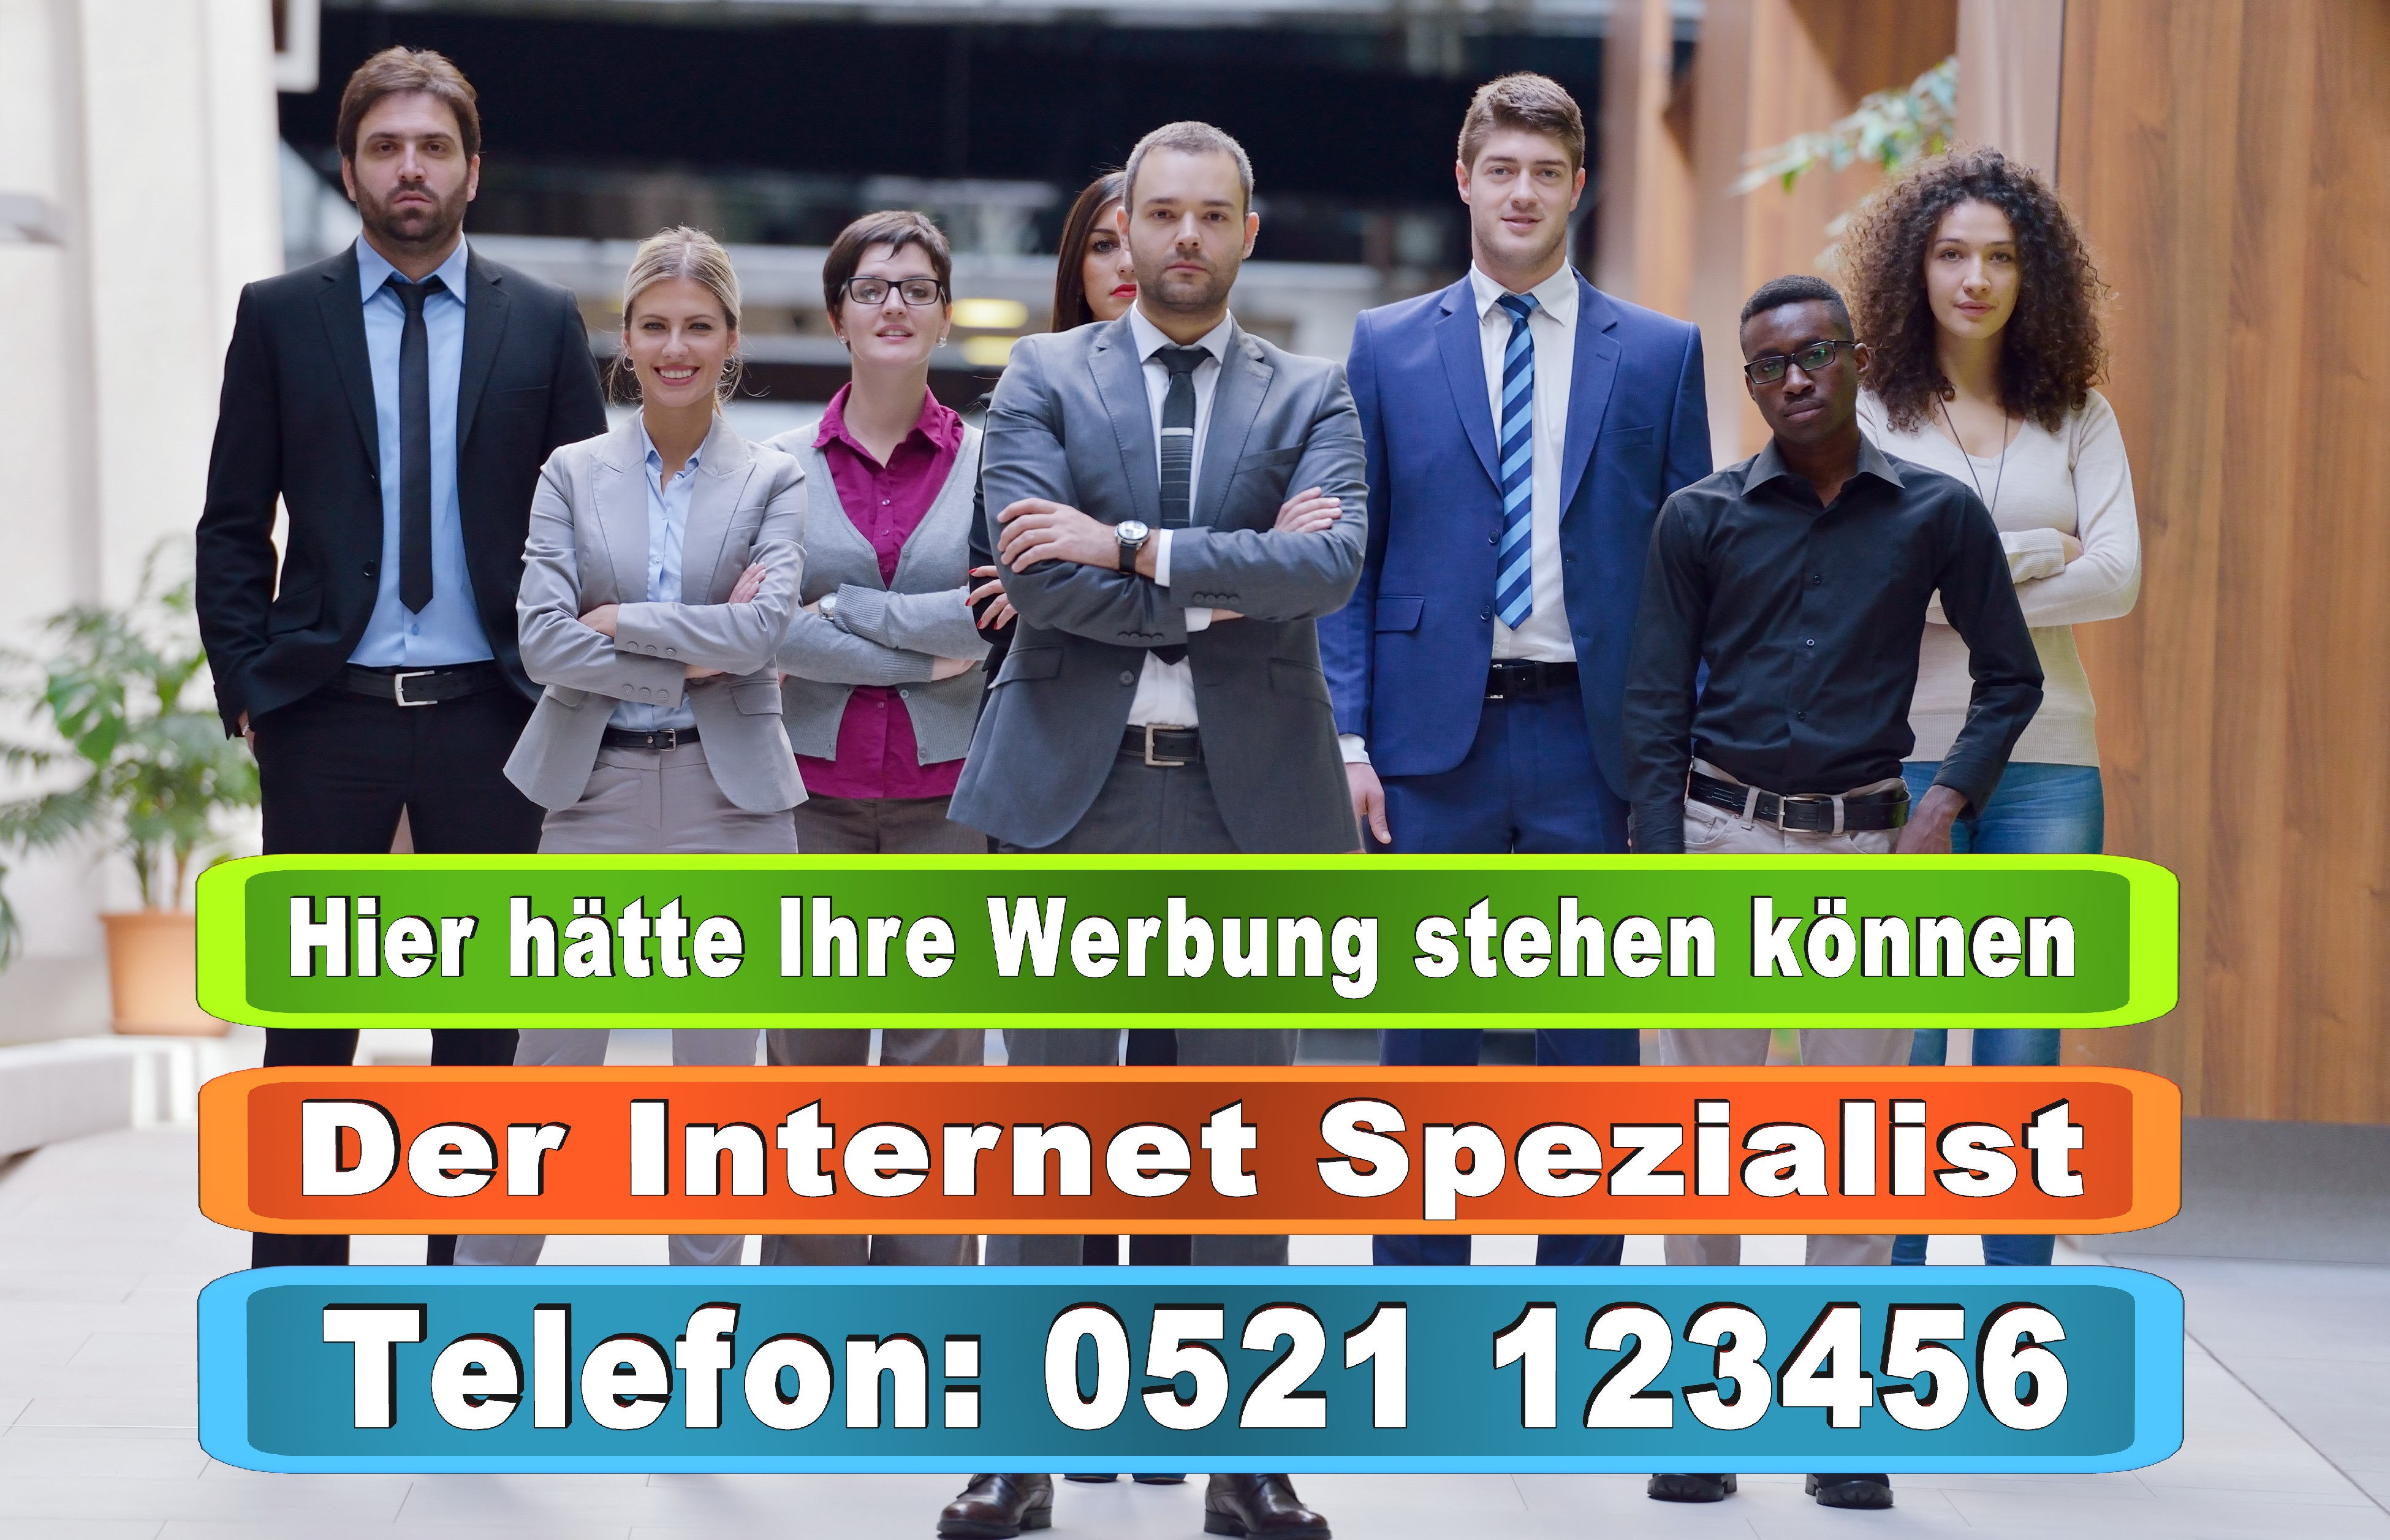 Rechtsanwaltskanzlei Bielefeld NRW OWL Rechtsanwalt Kanzlei Büro Steuerberater Bielefeld Architekt Bielefeld (12)